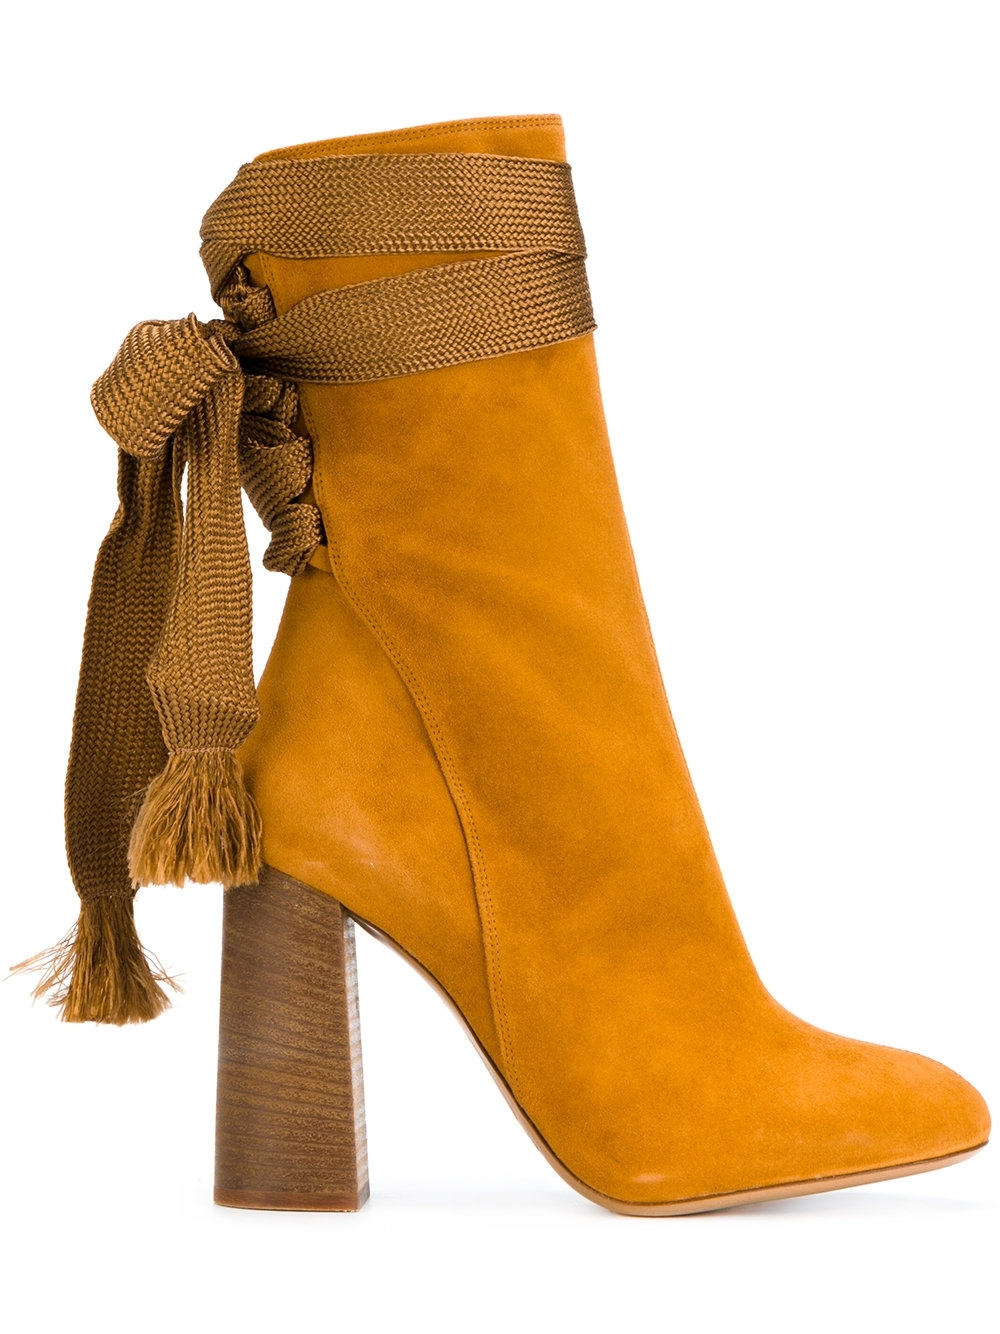 KirnaZabete-Chloe-Harper-Boots-31.jpg